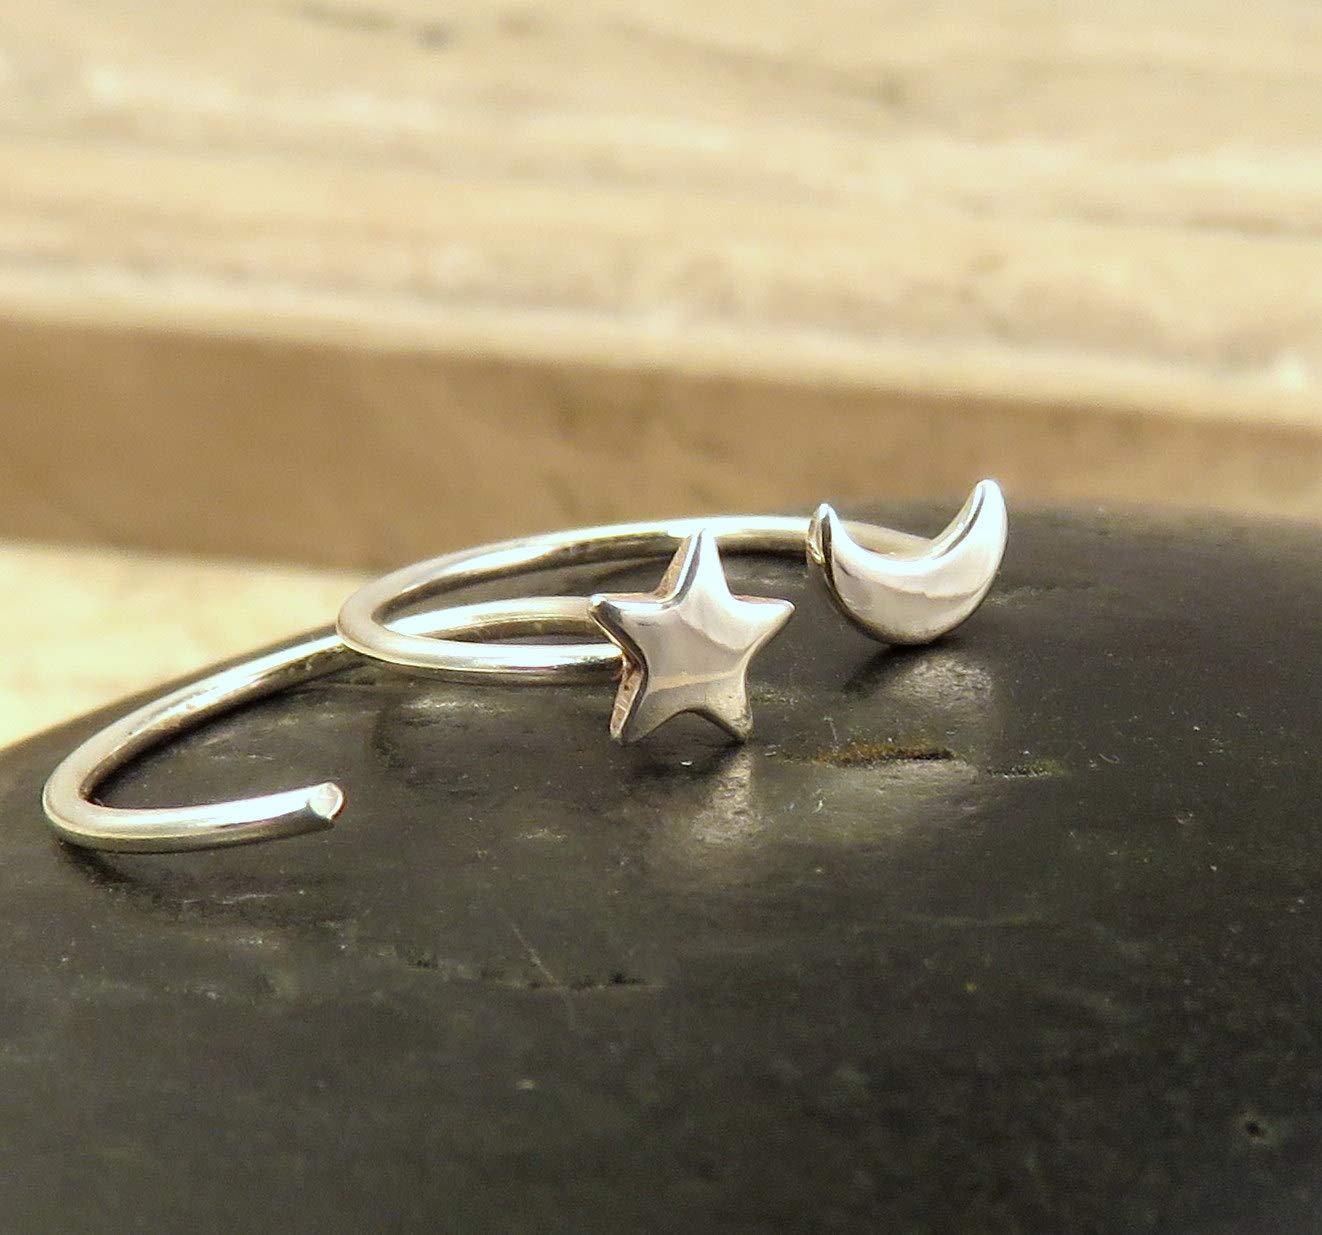 Moon and Stars Stud Earrings Ear Huggies 4mm Size